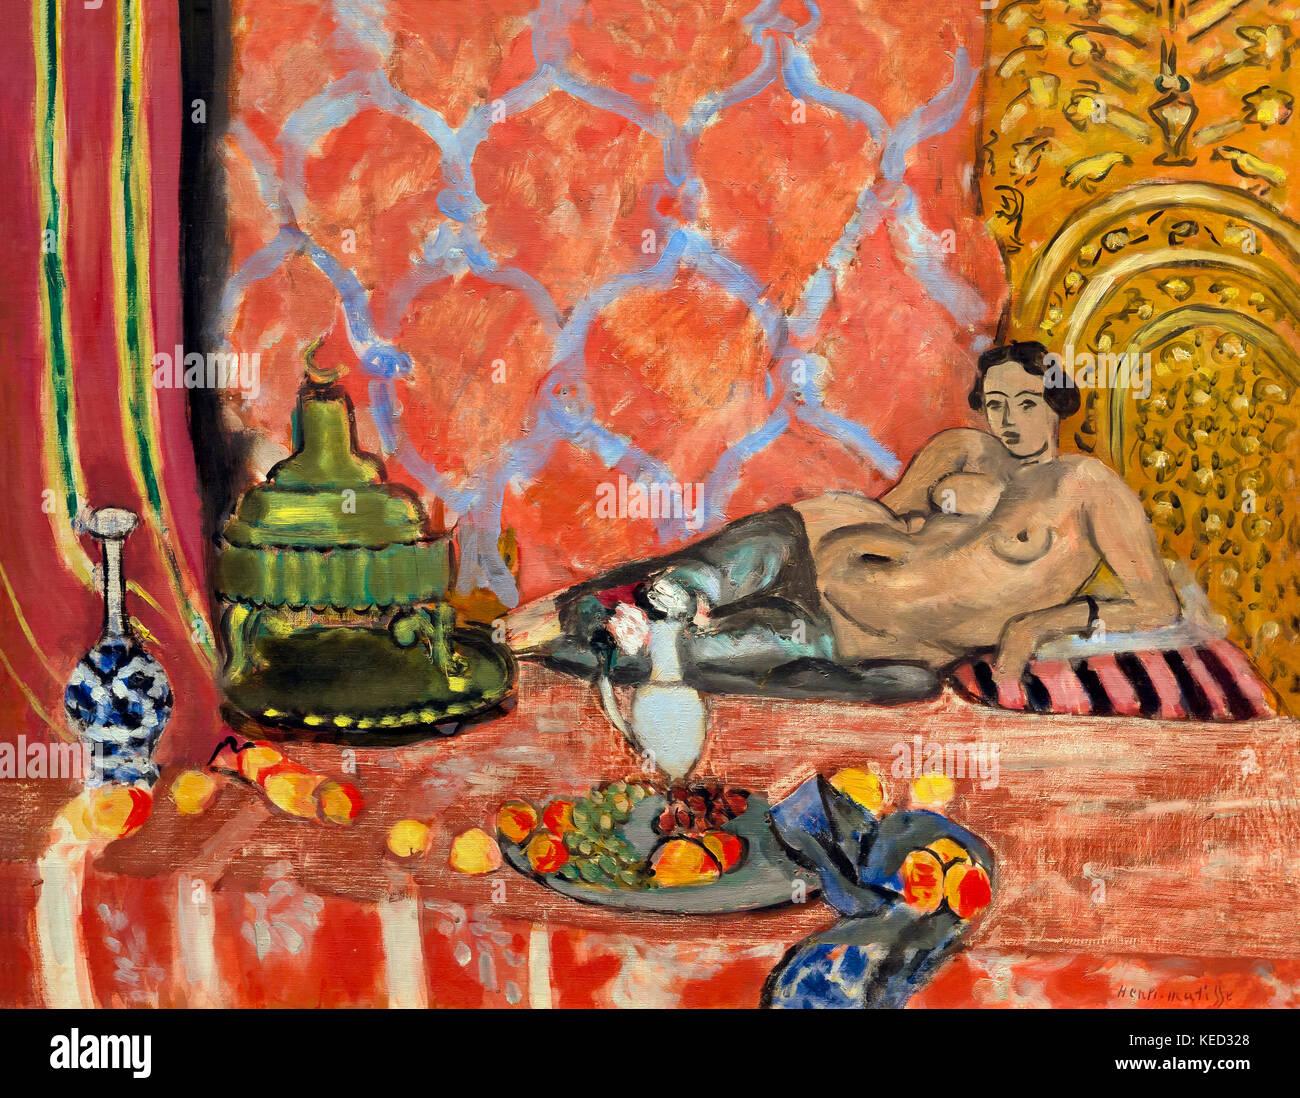 Odalisque with Gray Trousers, Henri Matisse, 1927, Metropolitan Museum of Art, Manhattan, New York City, USA, North - Stock Image